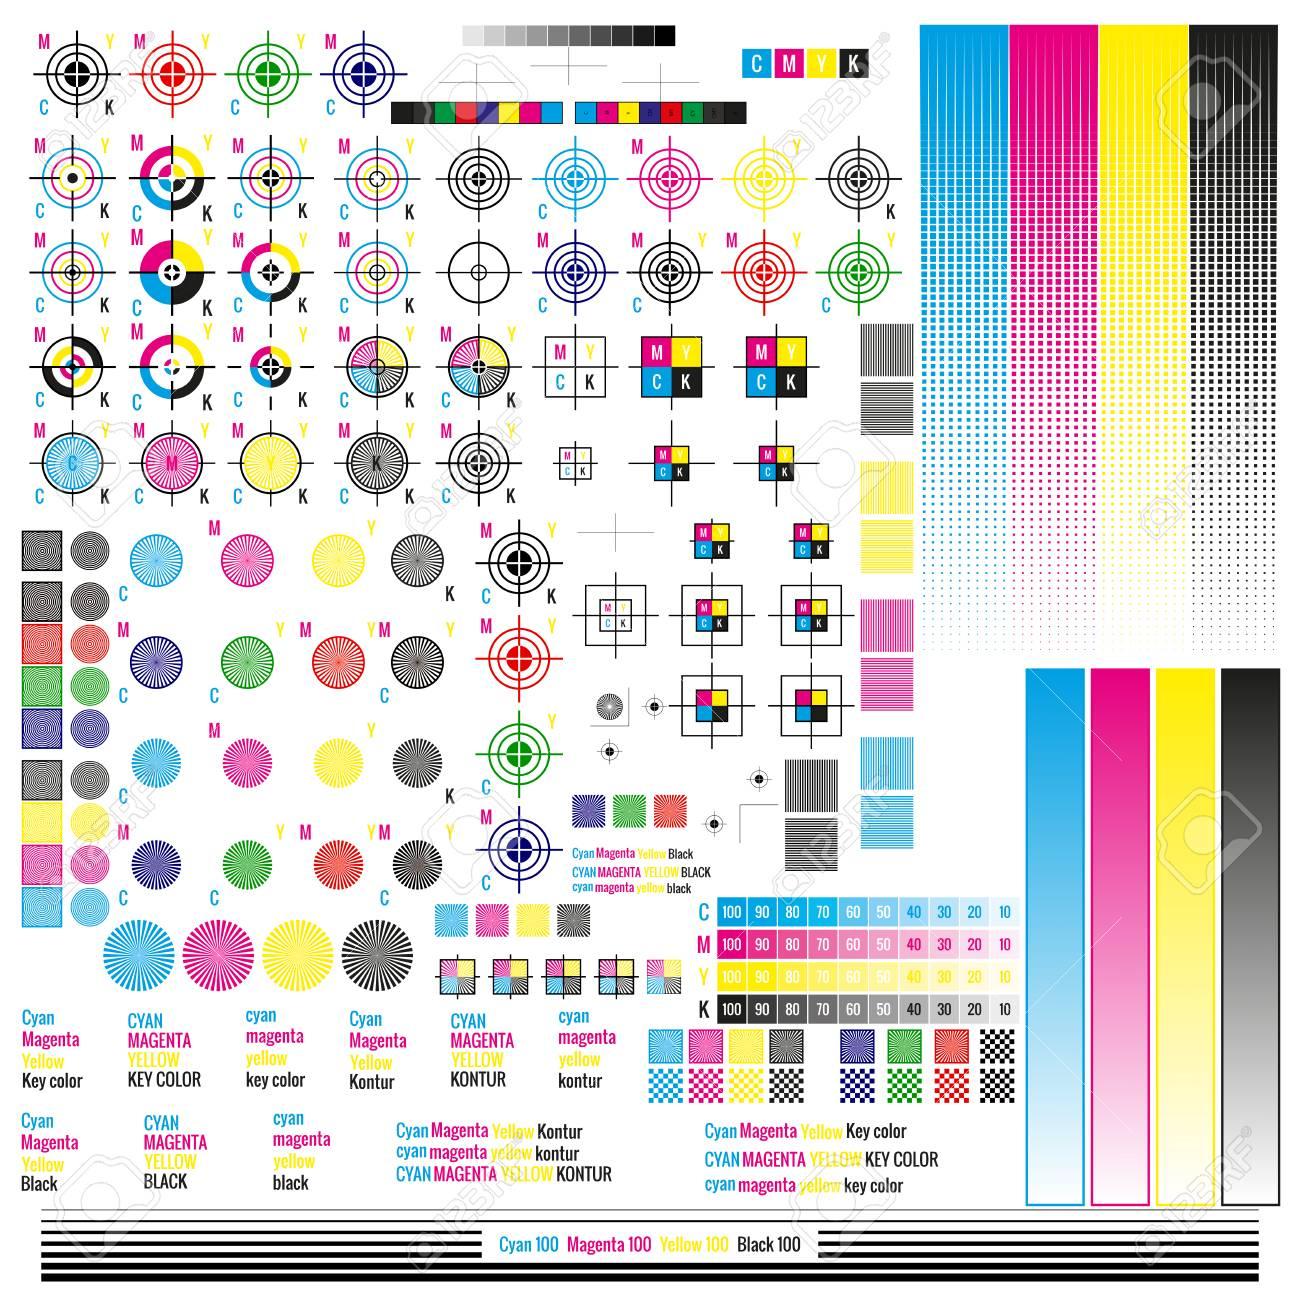 CMYK color management elements. Publishing graphic symbol utilities. Press mark. Calibration, cutting marks. - 115103865